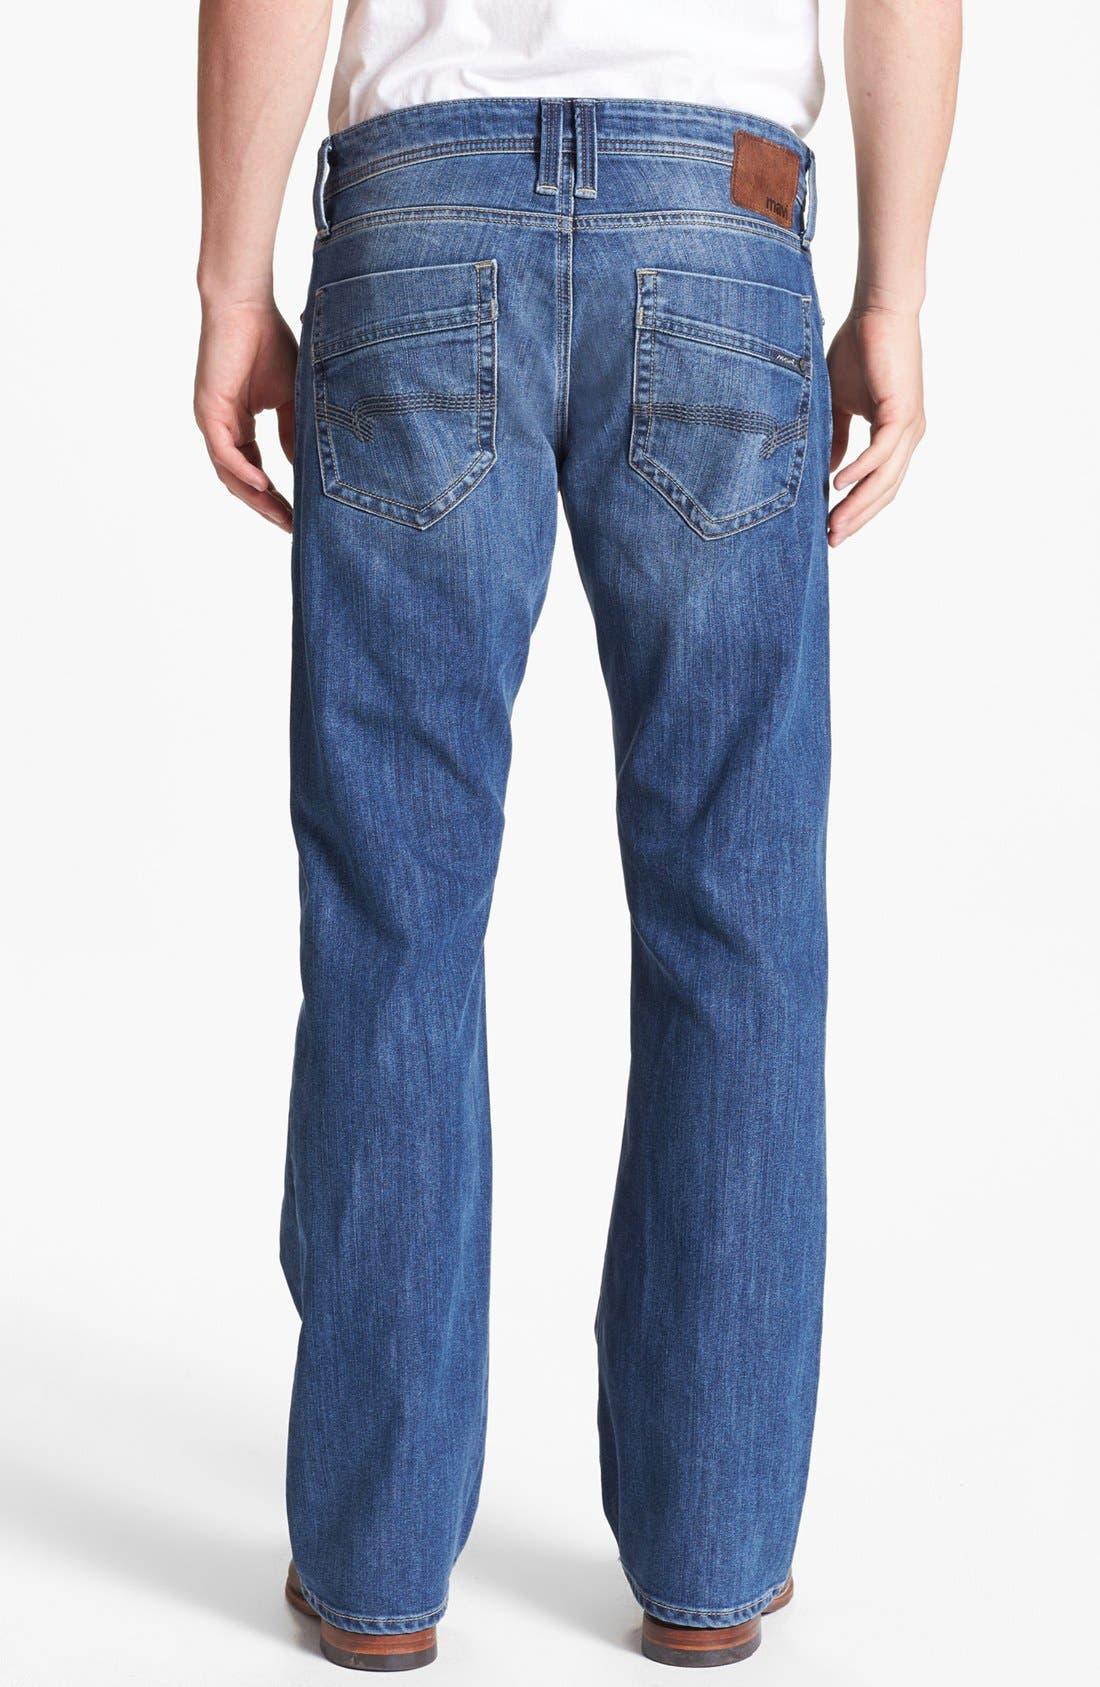 Alternate Image 1 Selected - Mavi Jeans 'Josh' Bootcut Jeans (Mid Cooper)